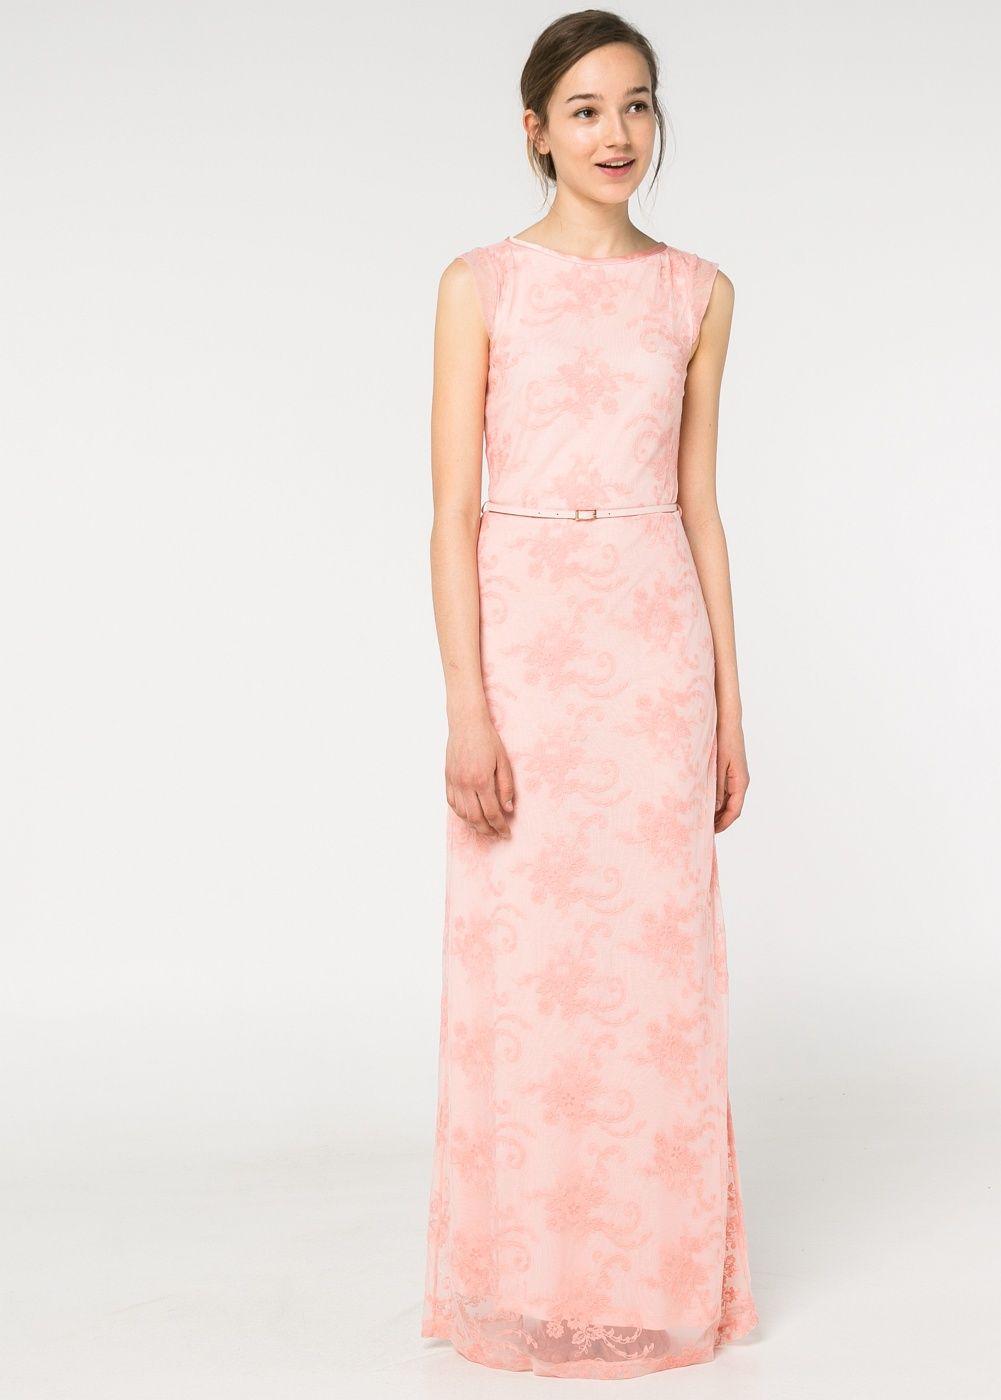 Vestido tul bordado - Mujer | Pinterest | Vestido tul, Tul y Mango